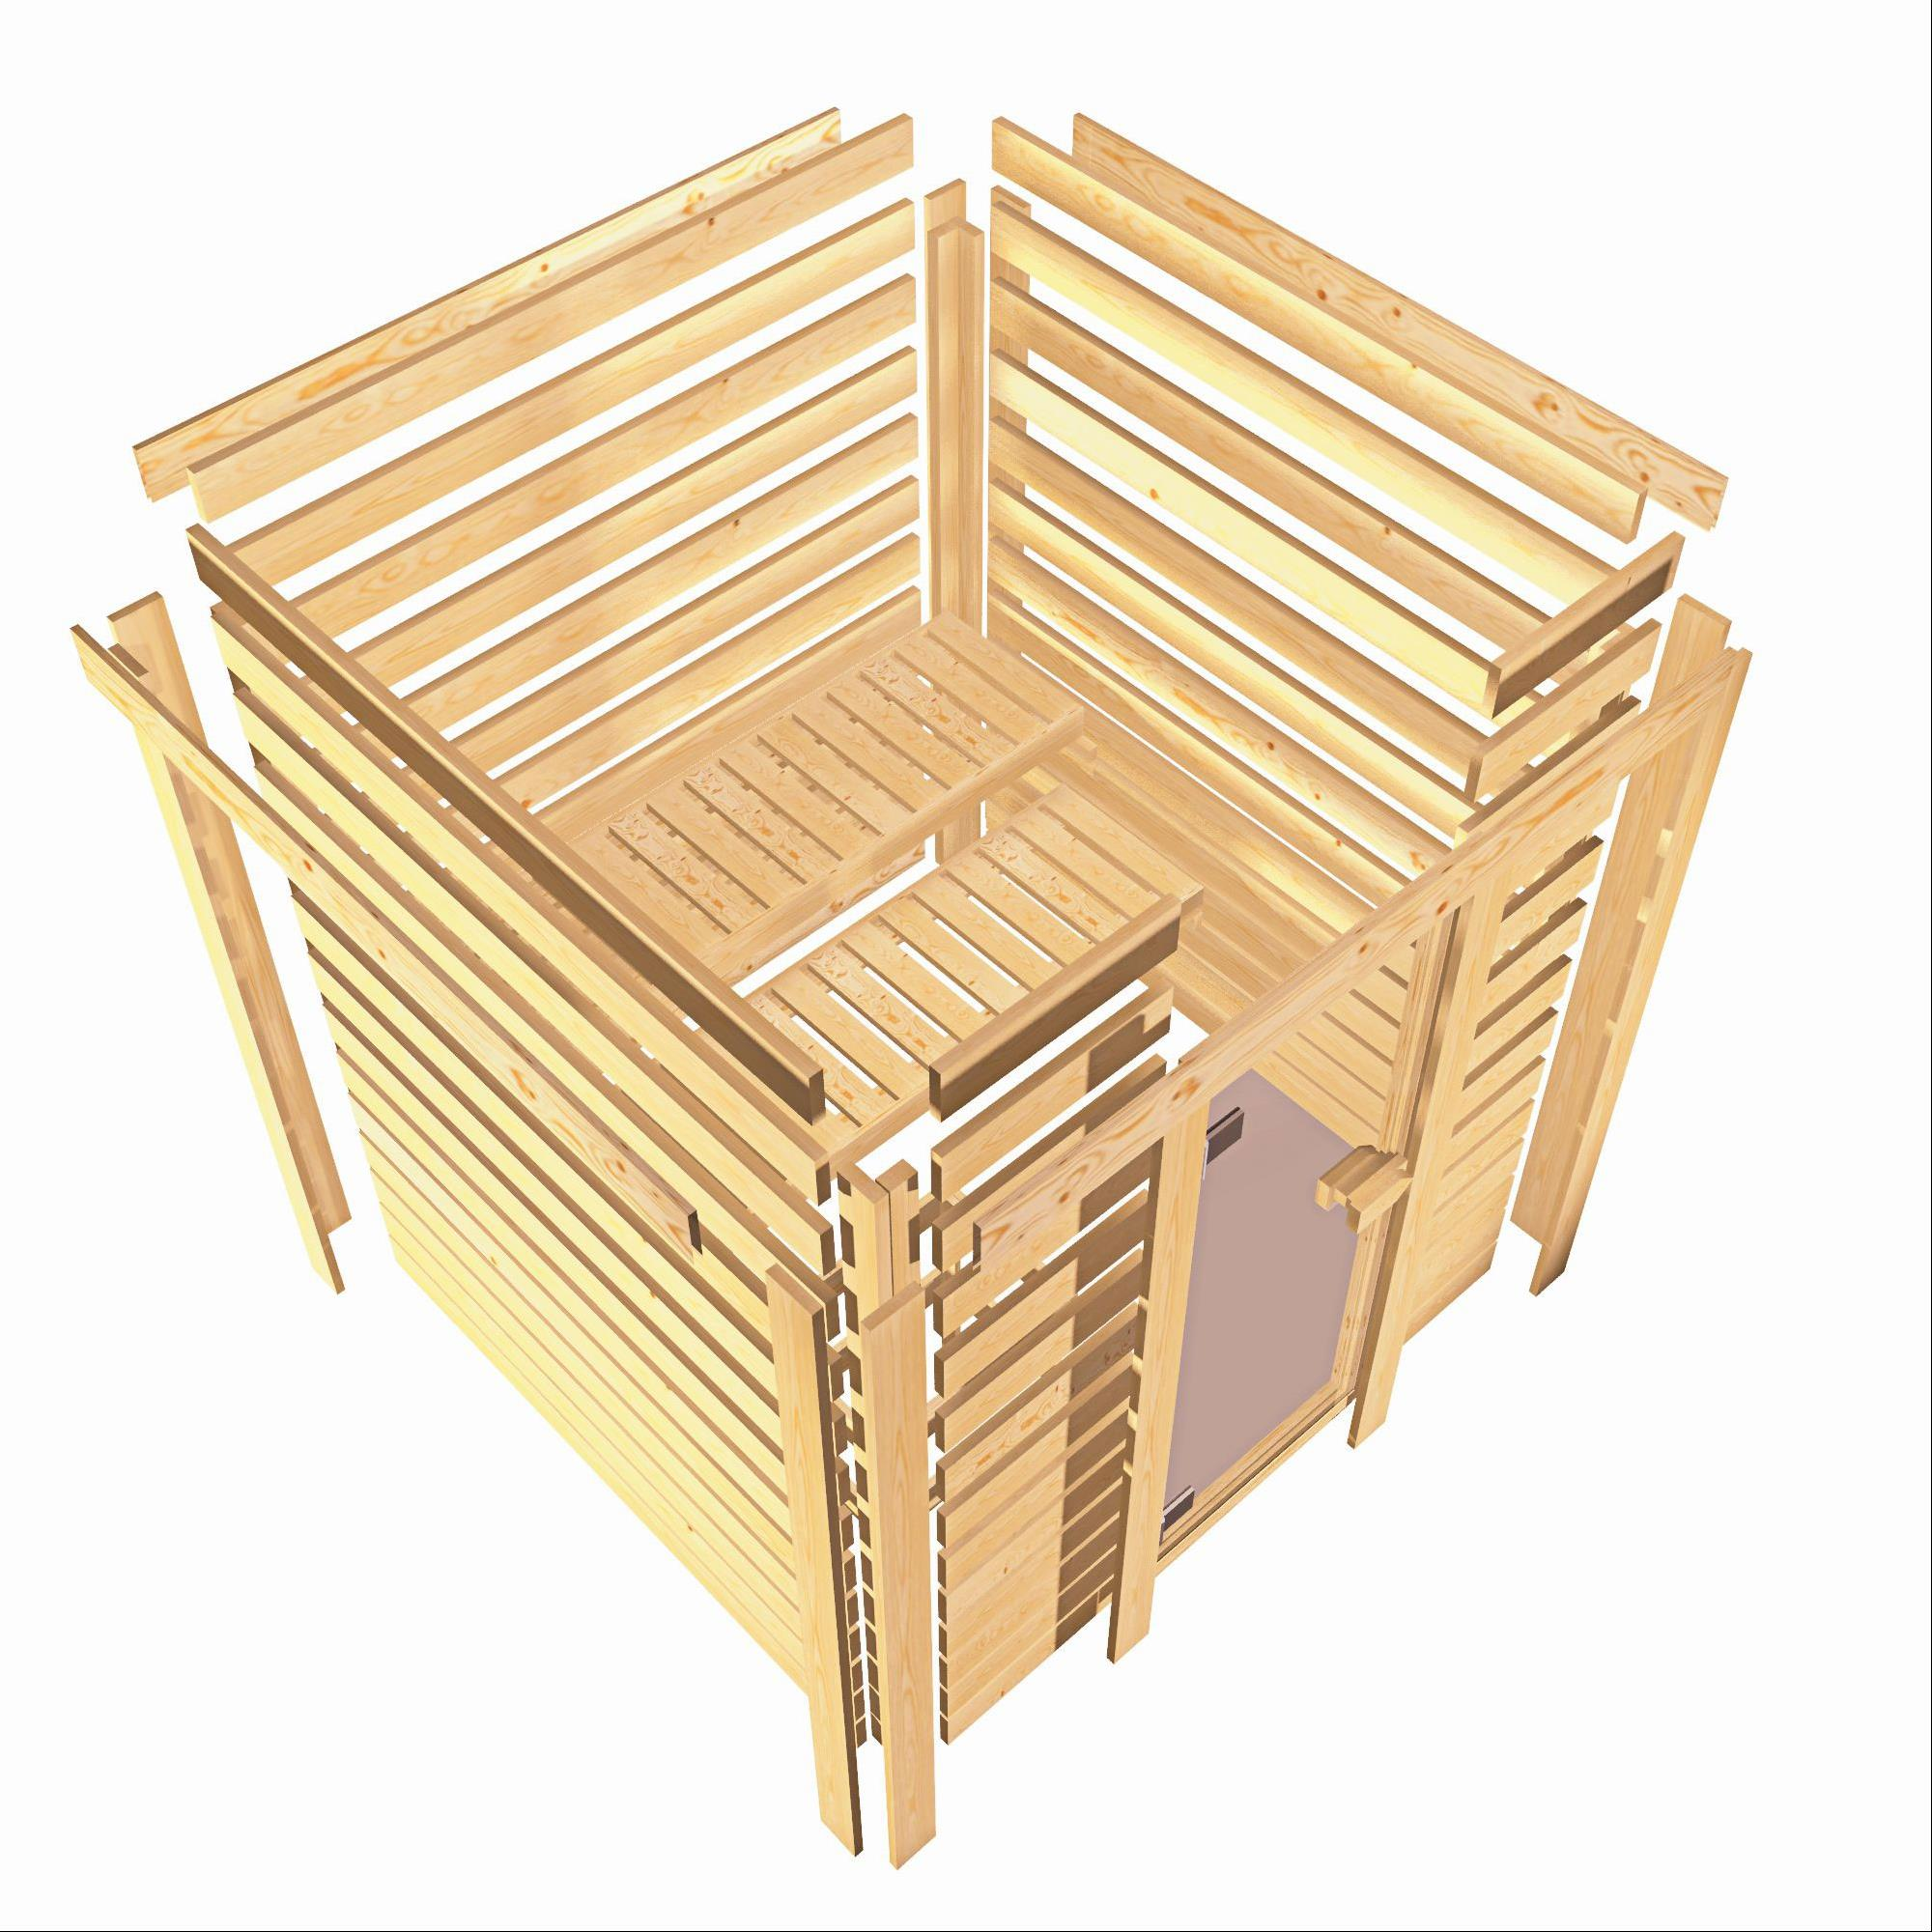 Woodfeeling Sauna Franka 38mm Saunaofen 9kW ext. Dachkranz Classic Tür Bild 4